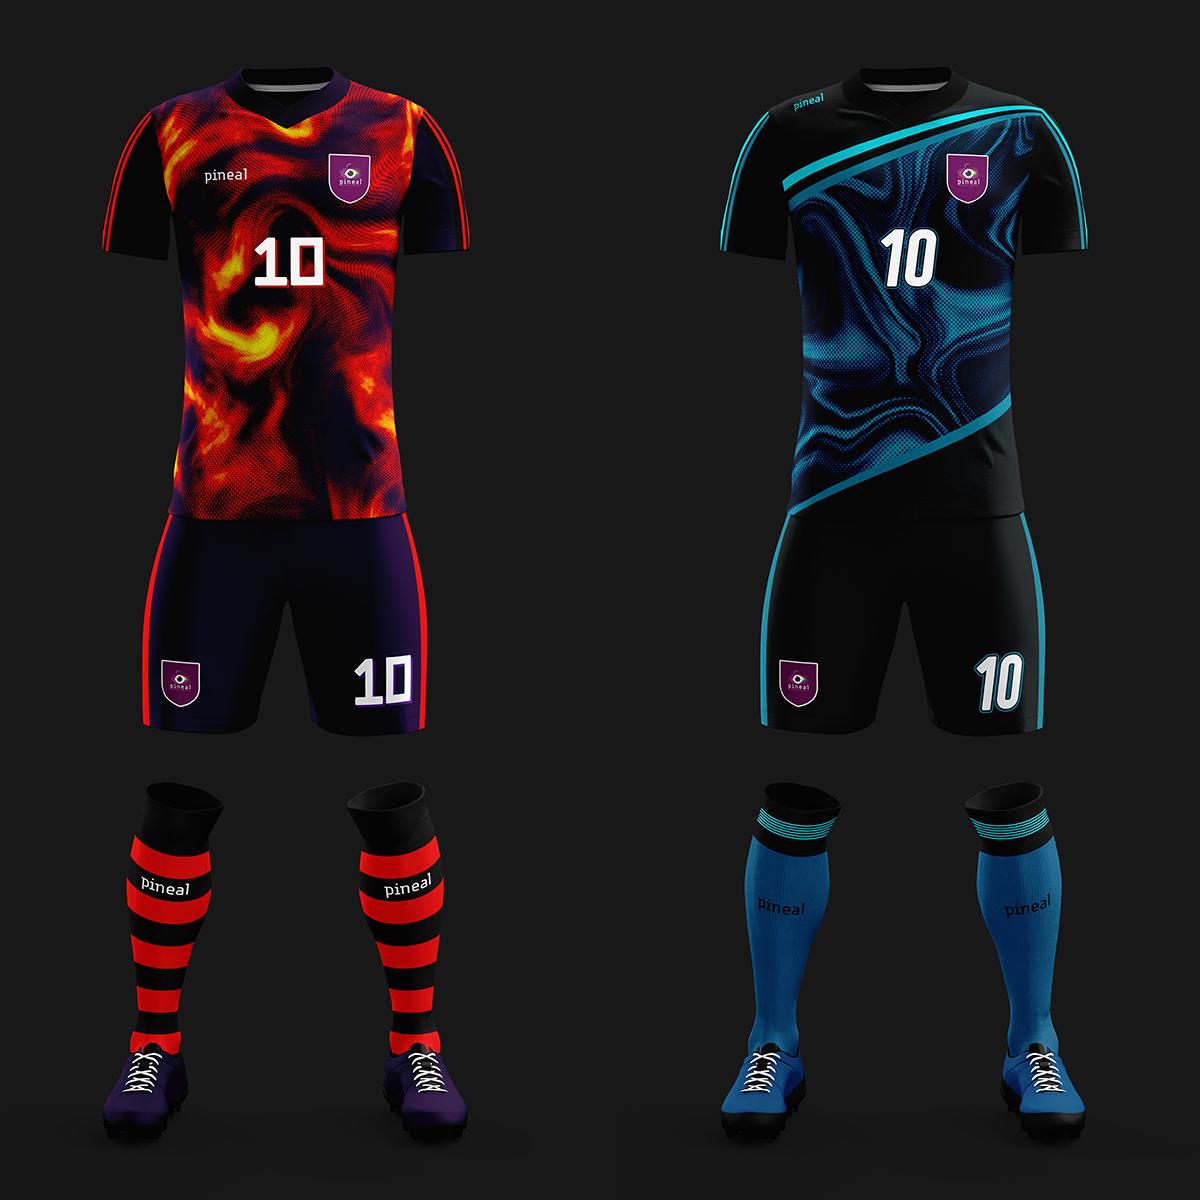 Pineal soccer kits